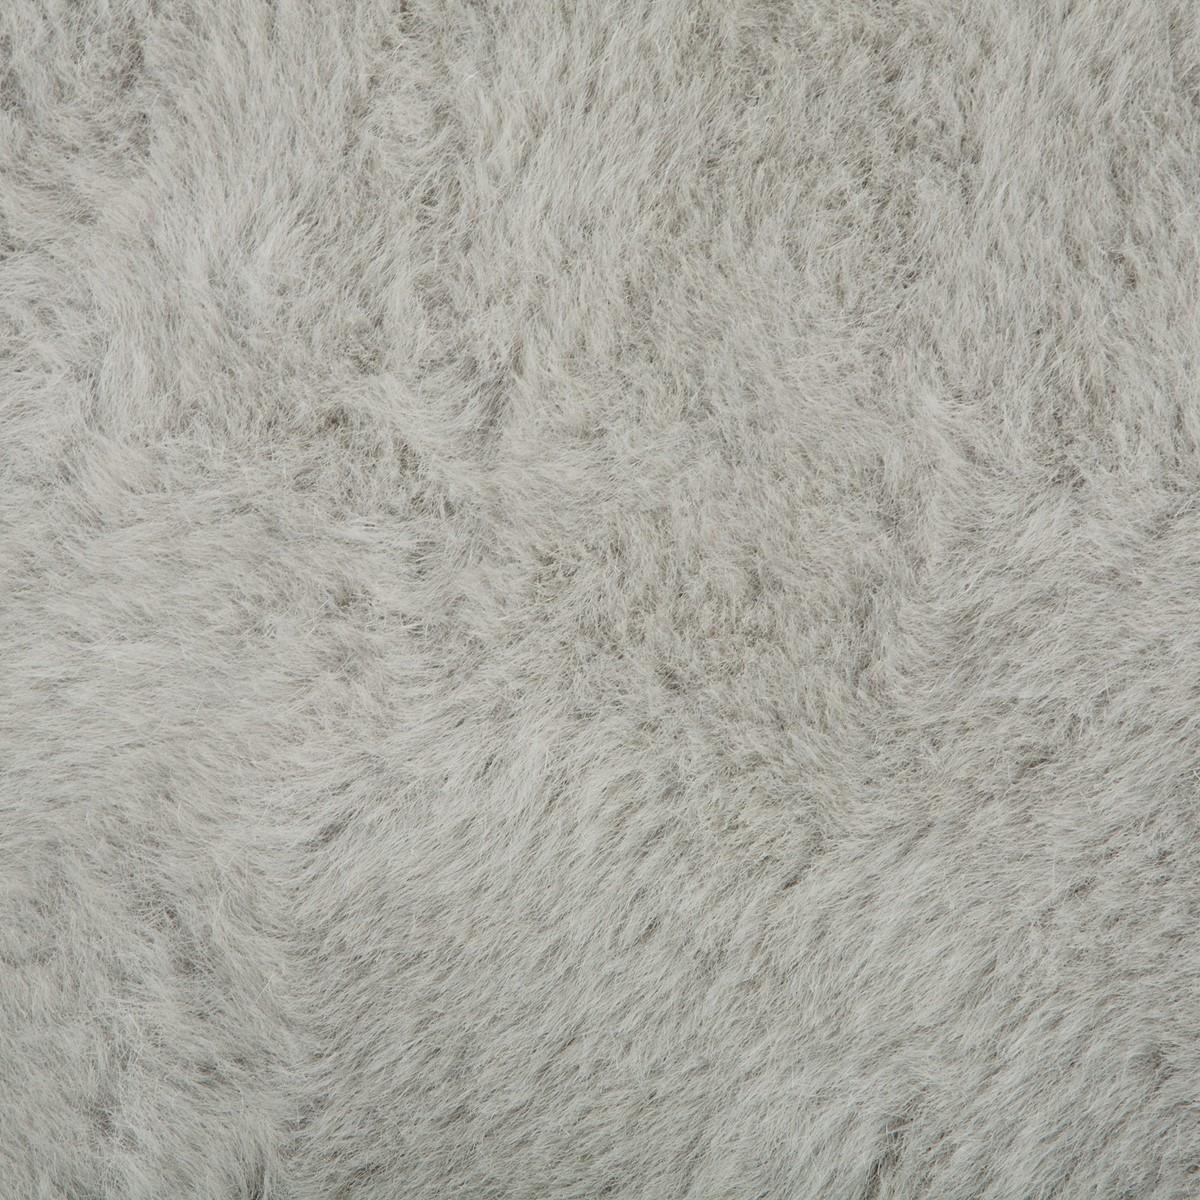 Grand tapis nuage gris clair 140 x 200 cm pilepoil Grand tapis clair